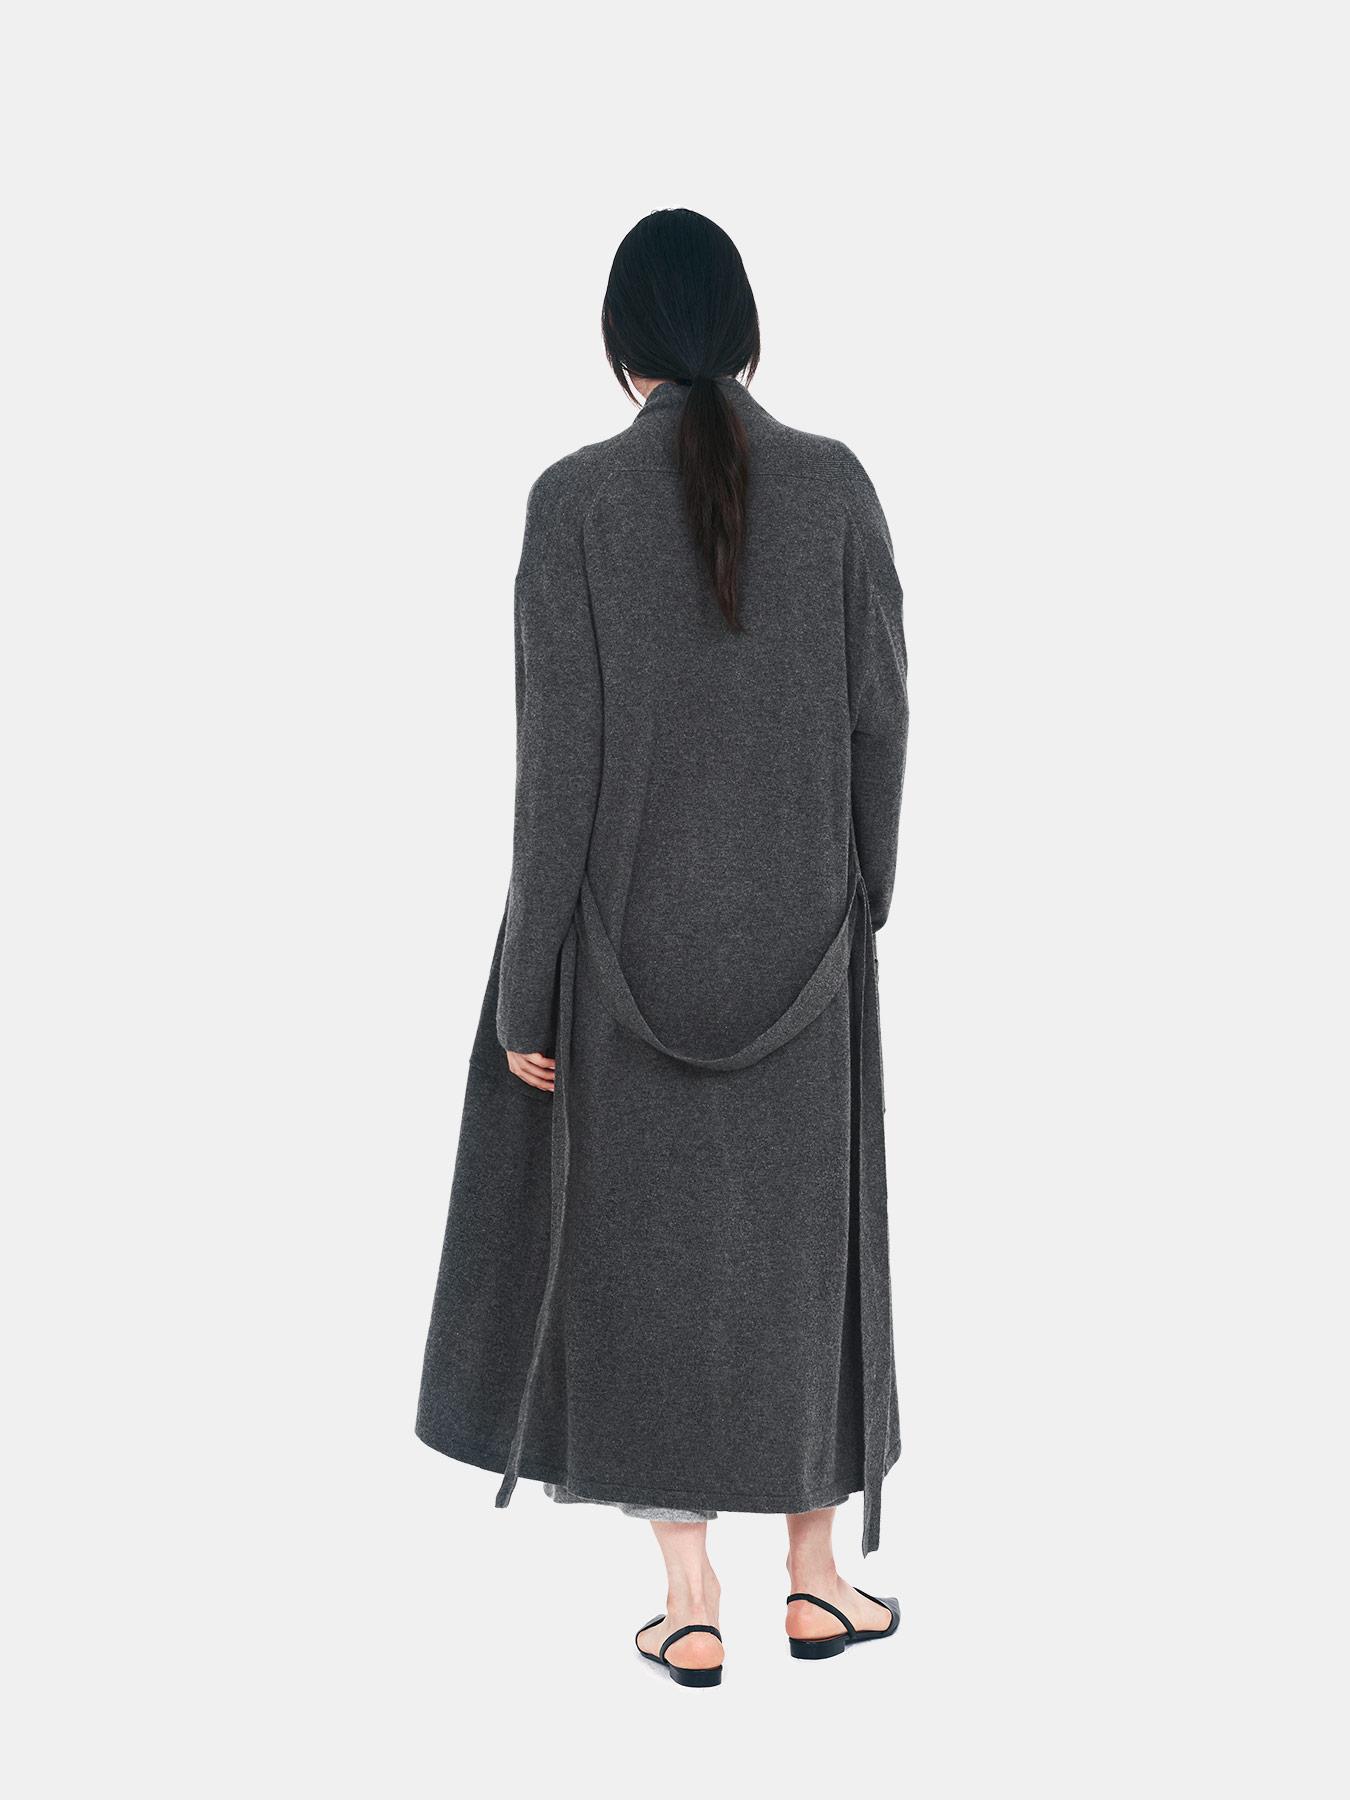 versatile-long-cardigan-grey-b